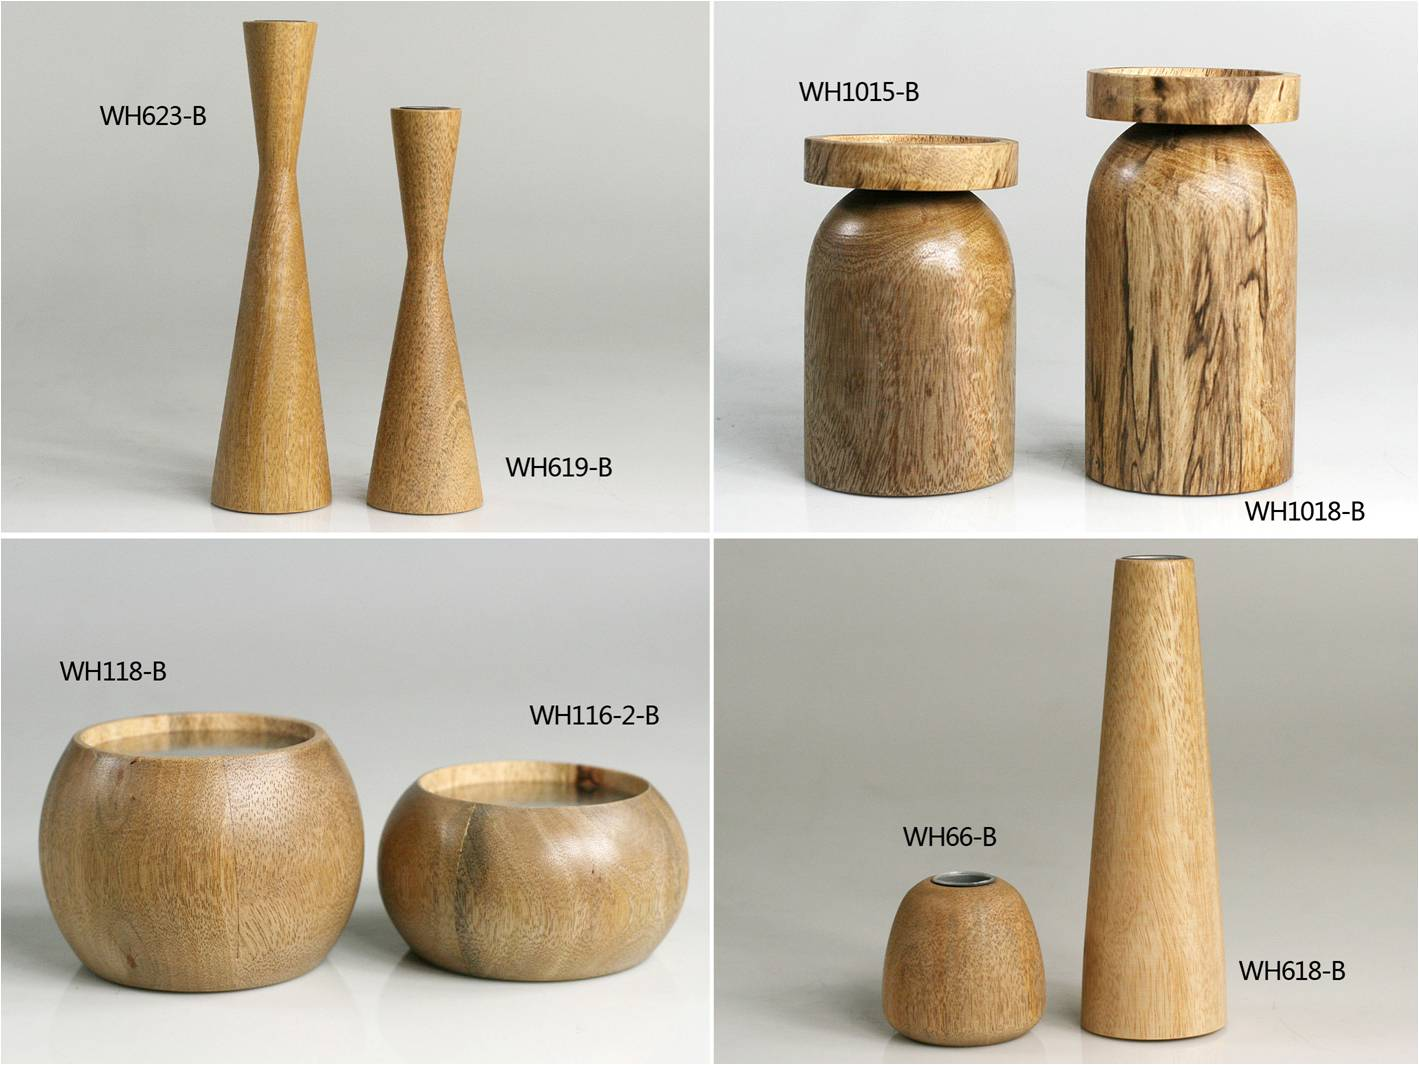 木艺产品 Wooden Products-15